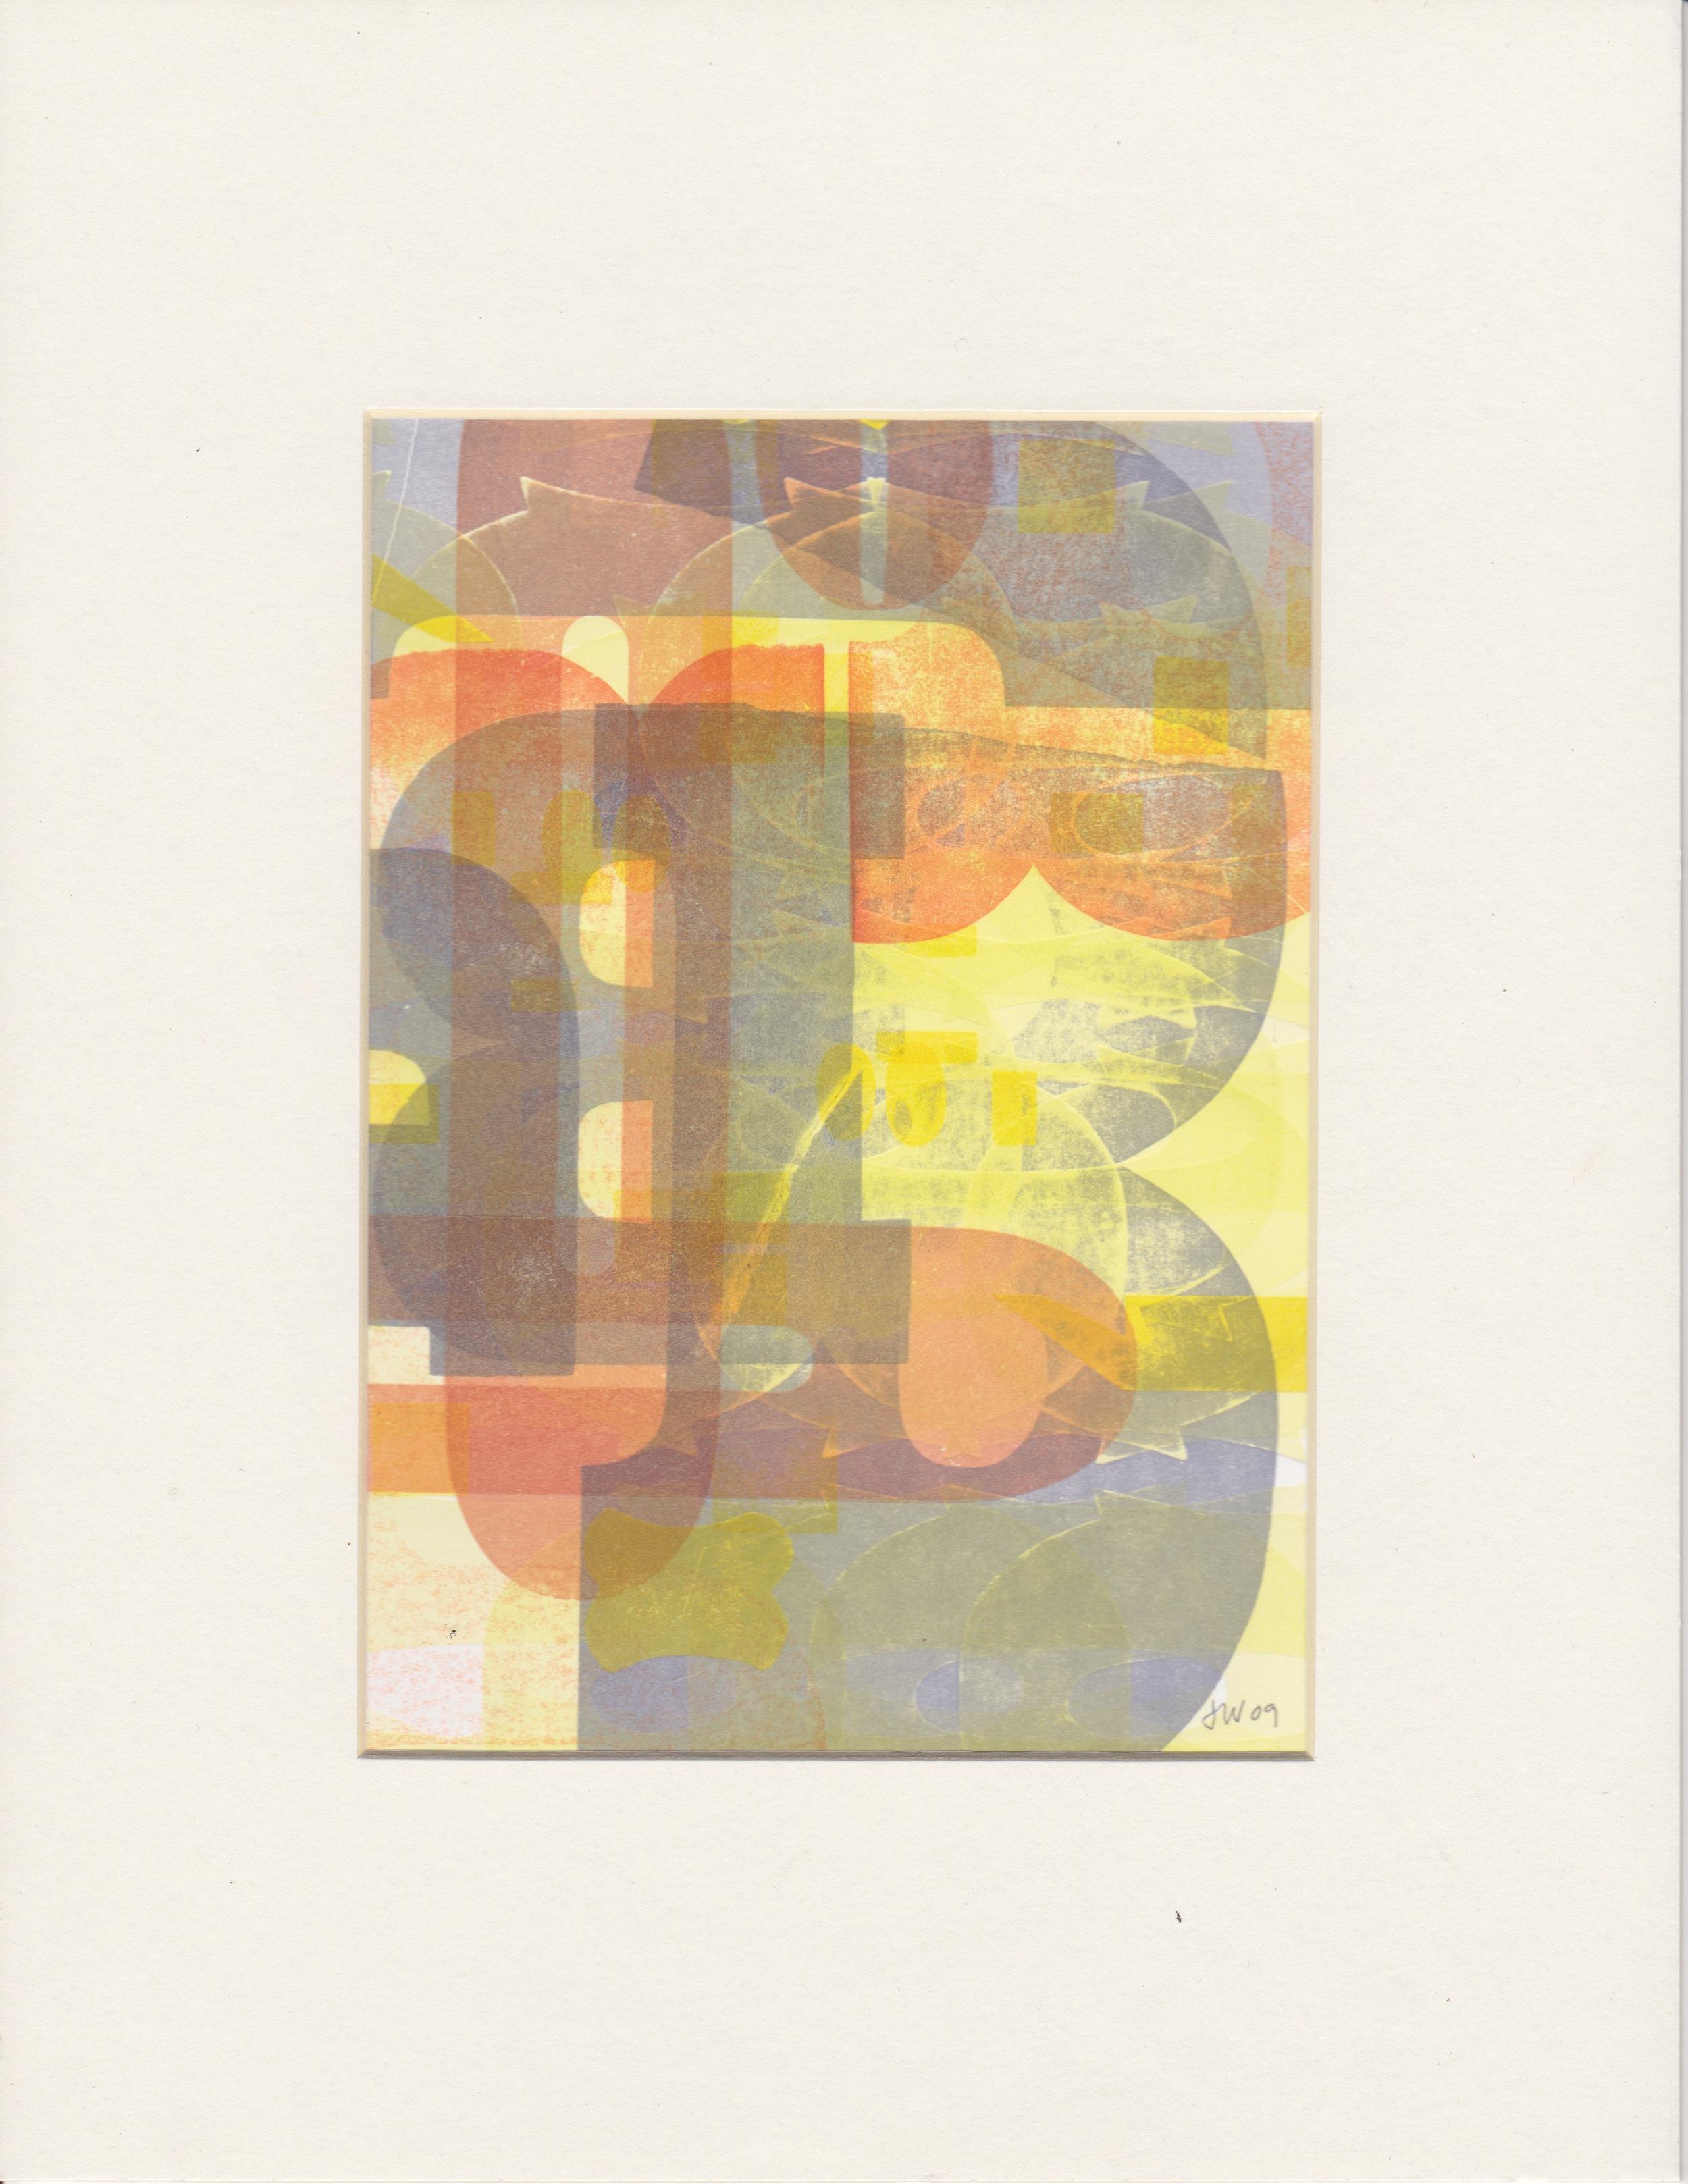 Woodtype Monotype 2